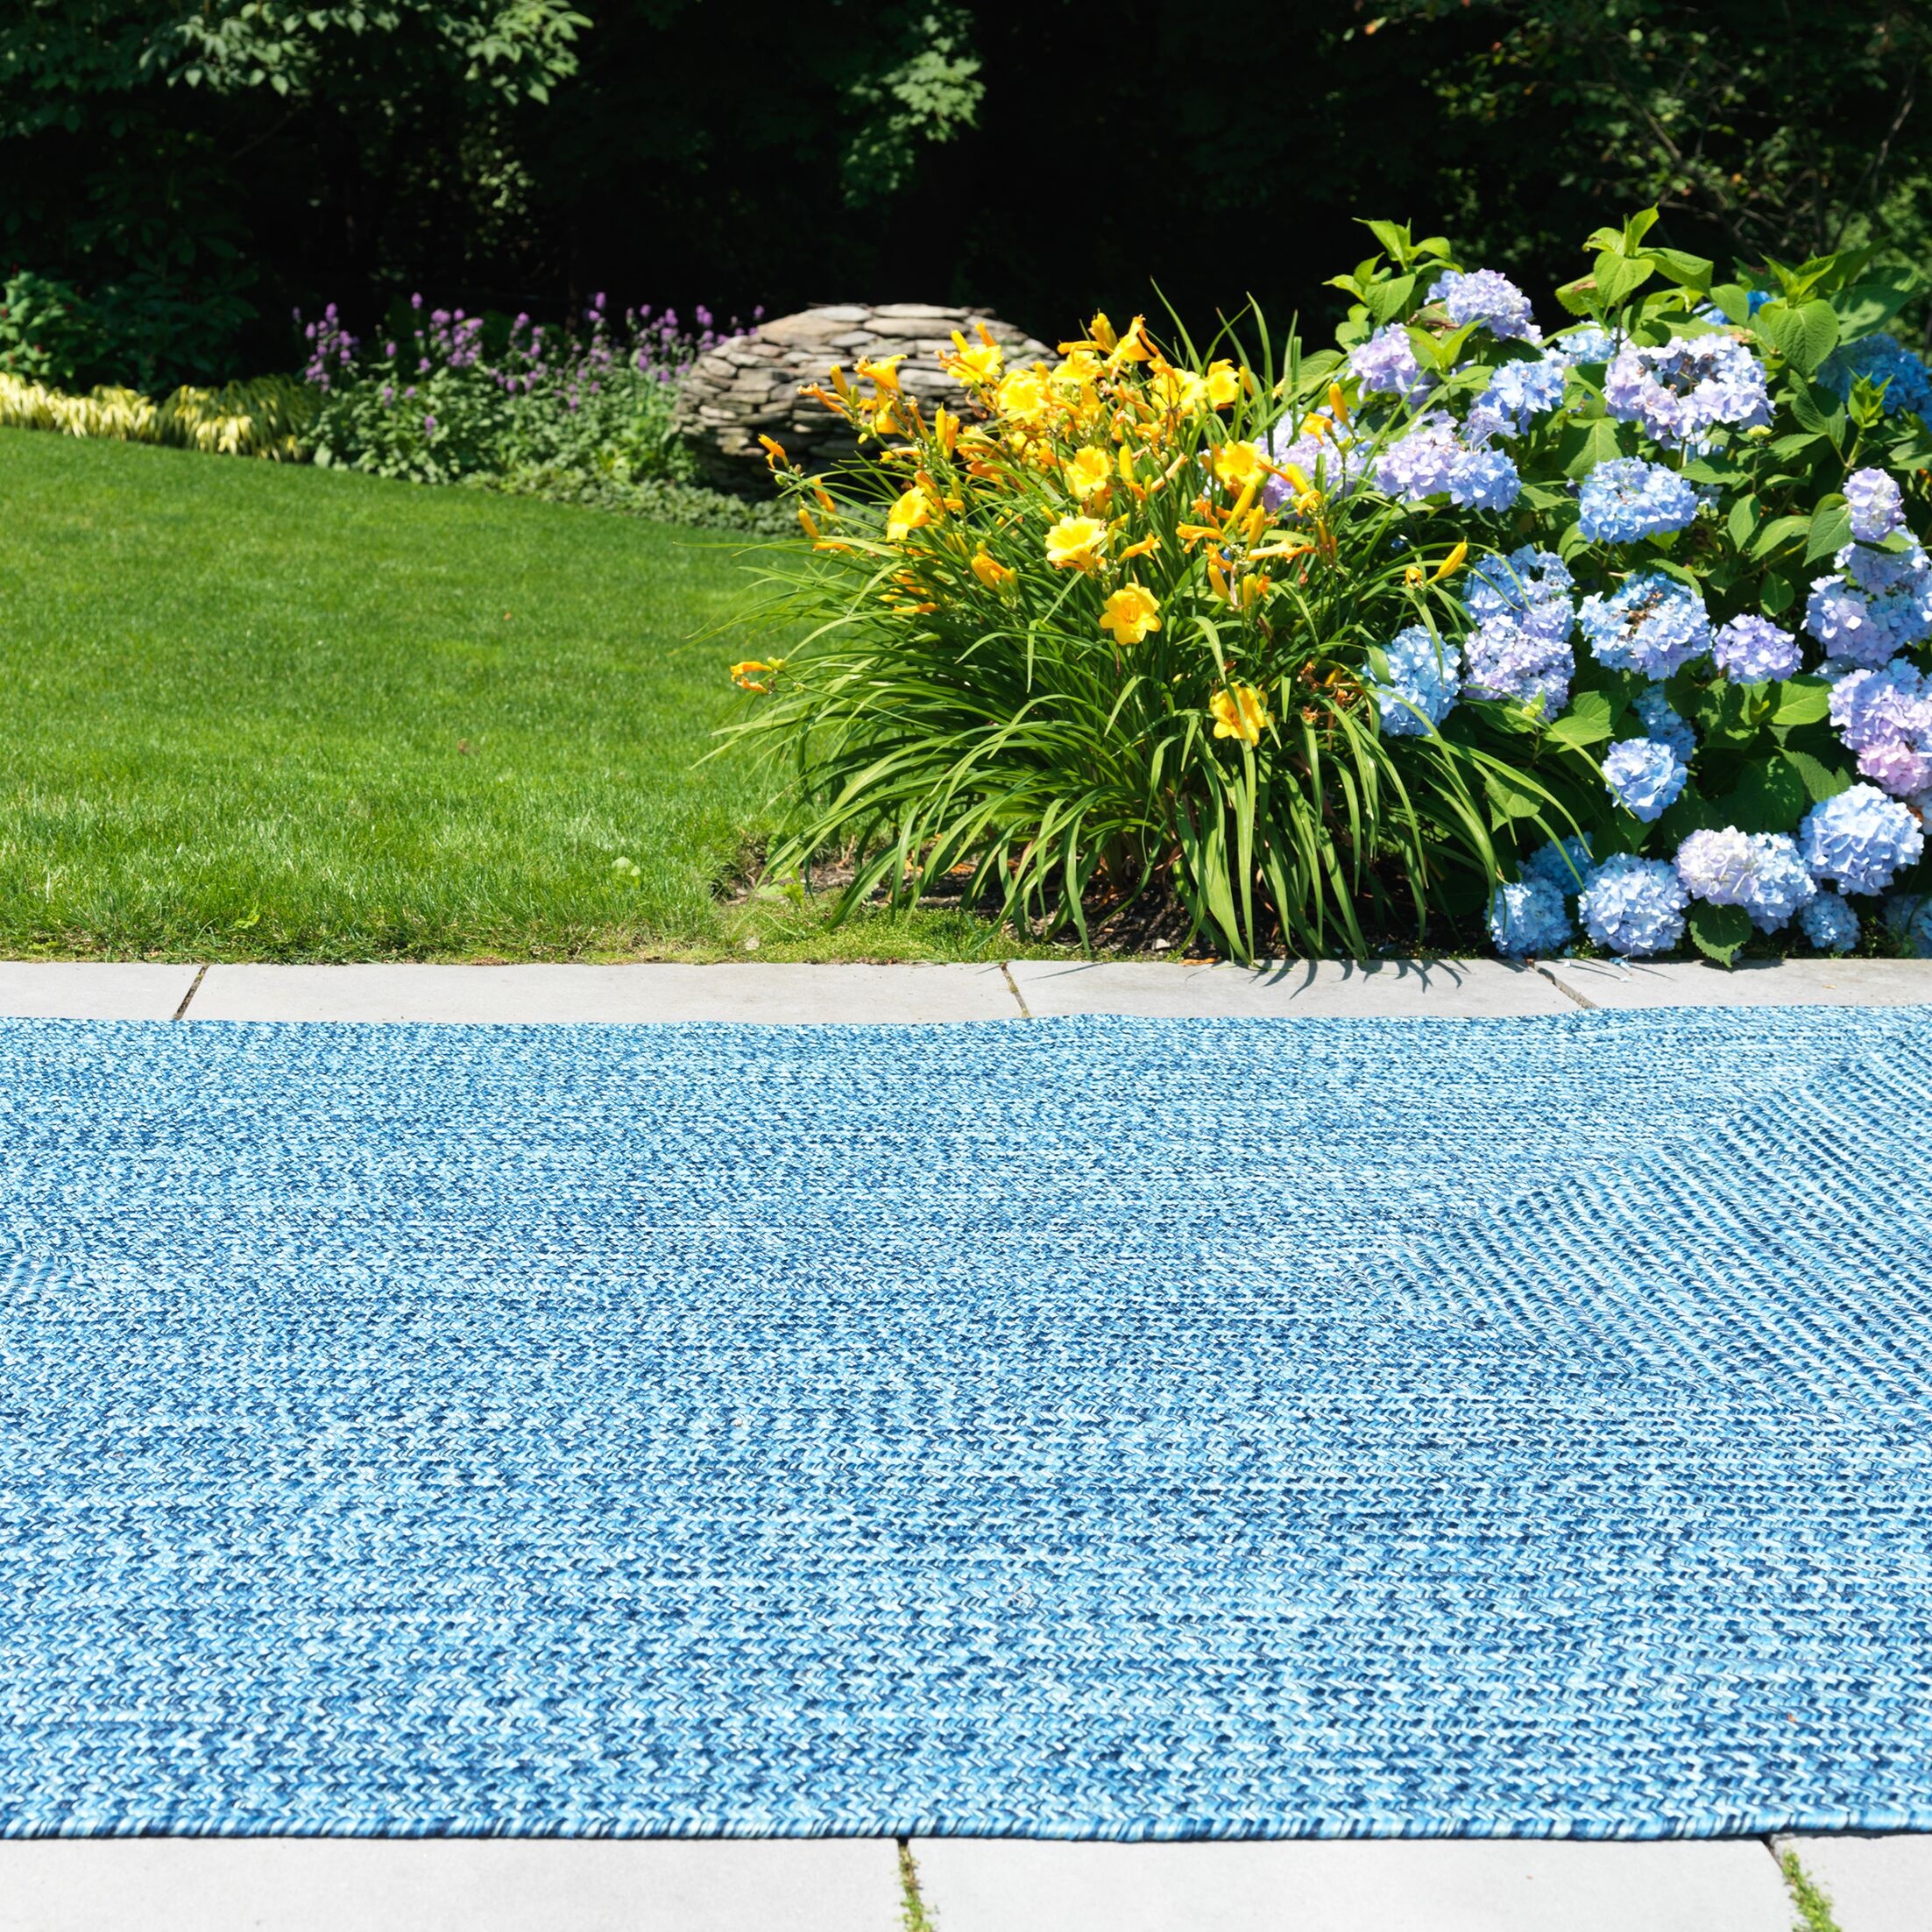 Hawkins Blue Wave Indoor/Outdoor Area Rug Rug Size: Square 8'